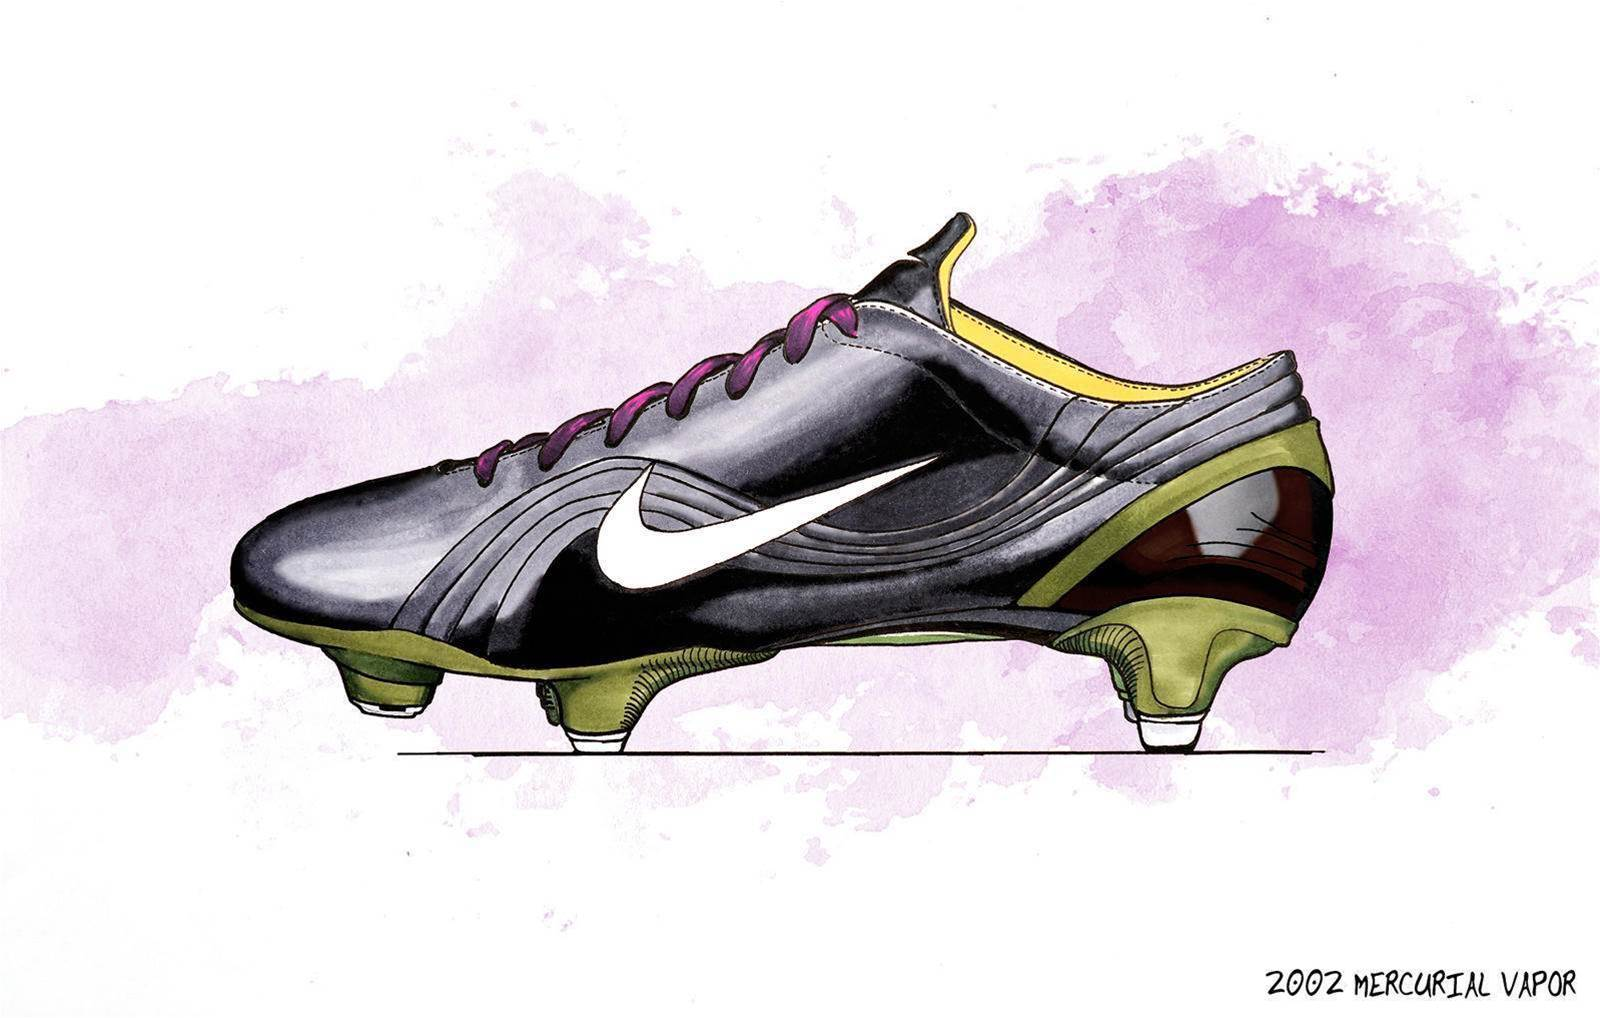 b986adeea5d History of the Nike Mercurial - Boots - FTBL